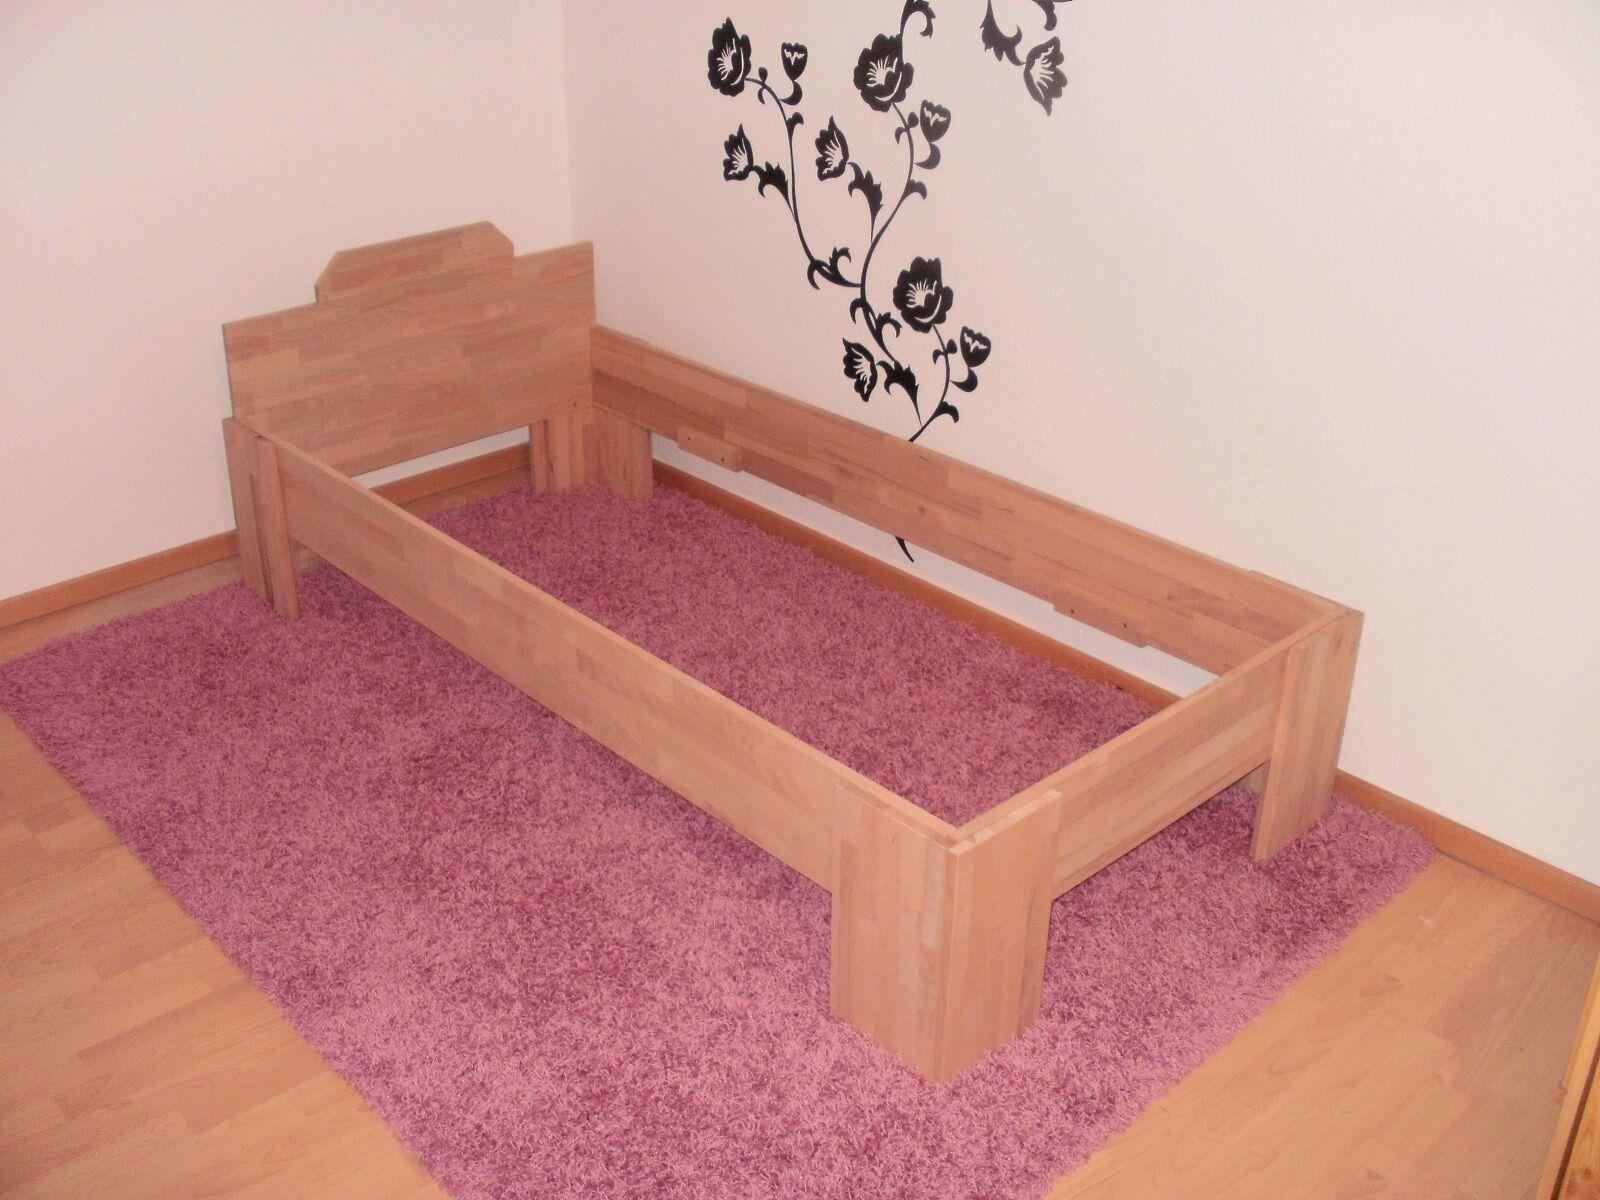 27mm holz bett vollholz echtholz massivholzbett 90x200. Black Bedroom Furniture Sets. Home Design Ideas